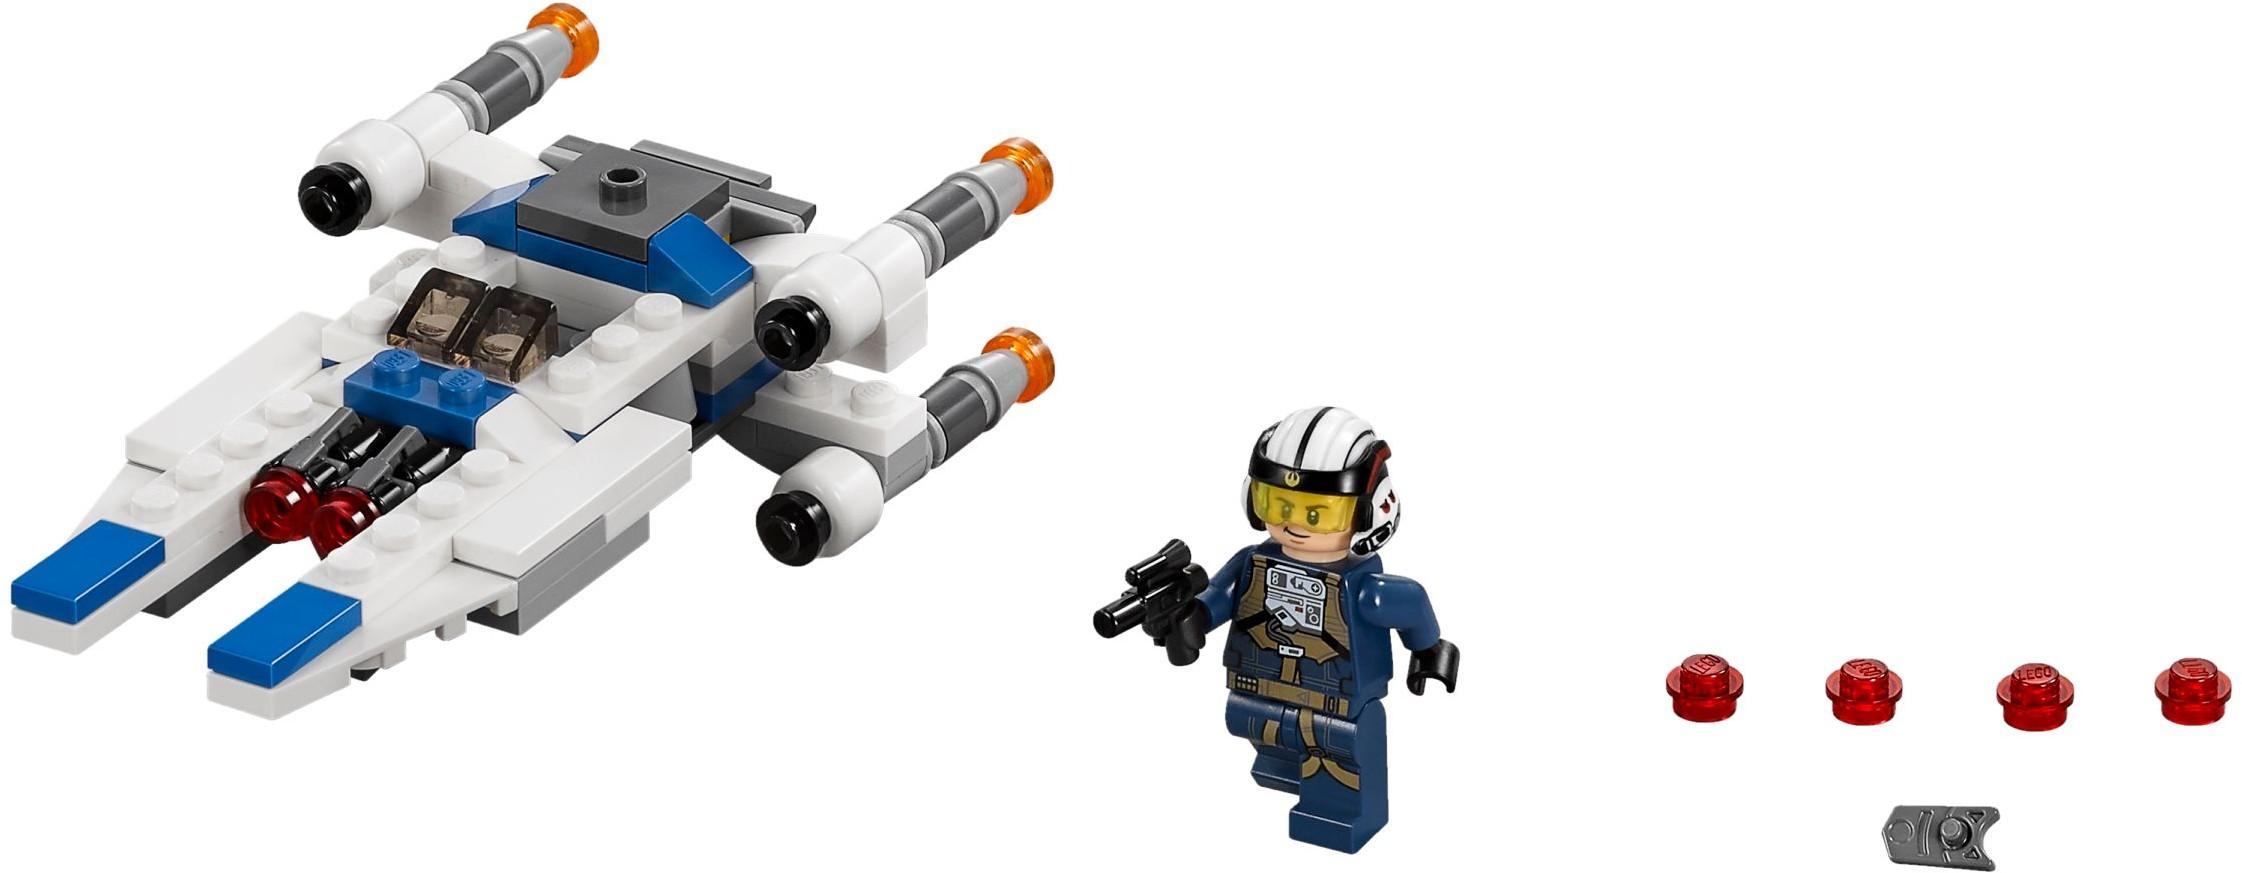 Star Wars | 2017 | Brickset: LEGO set guide and database